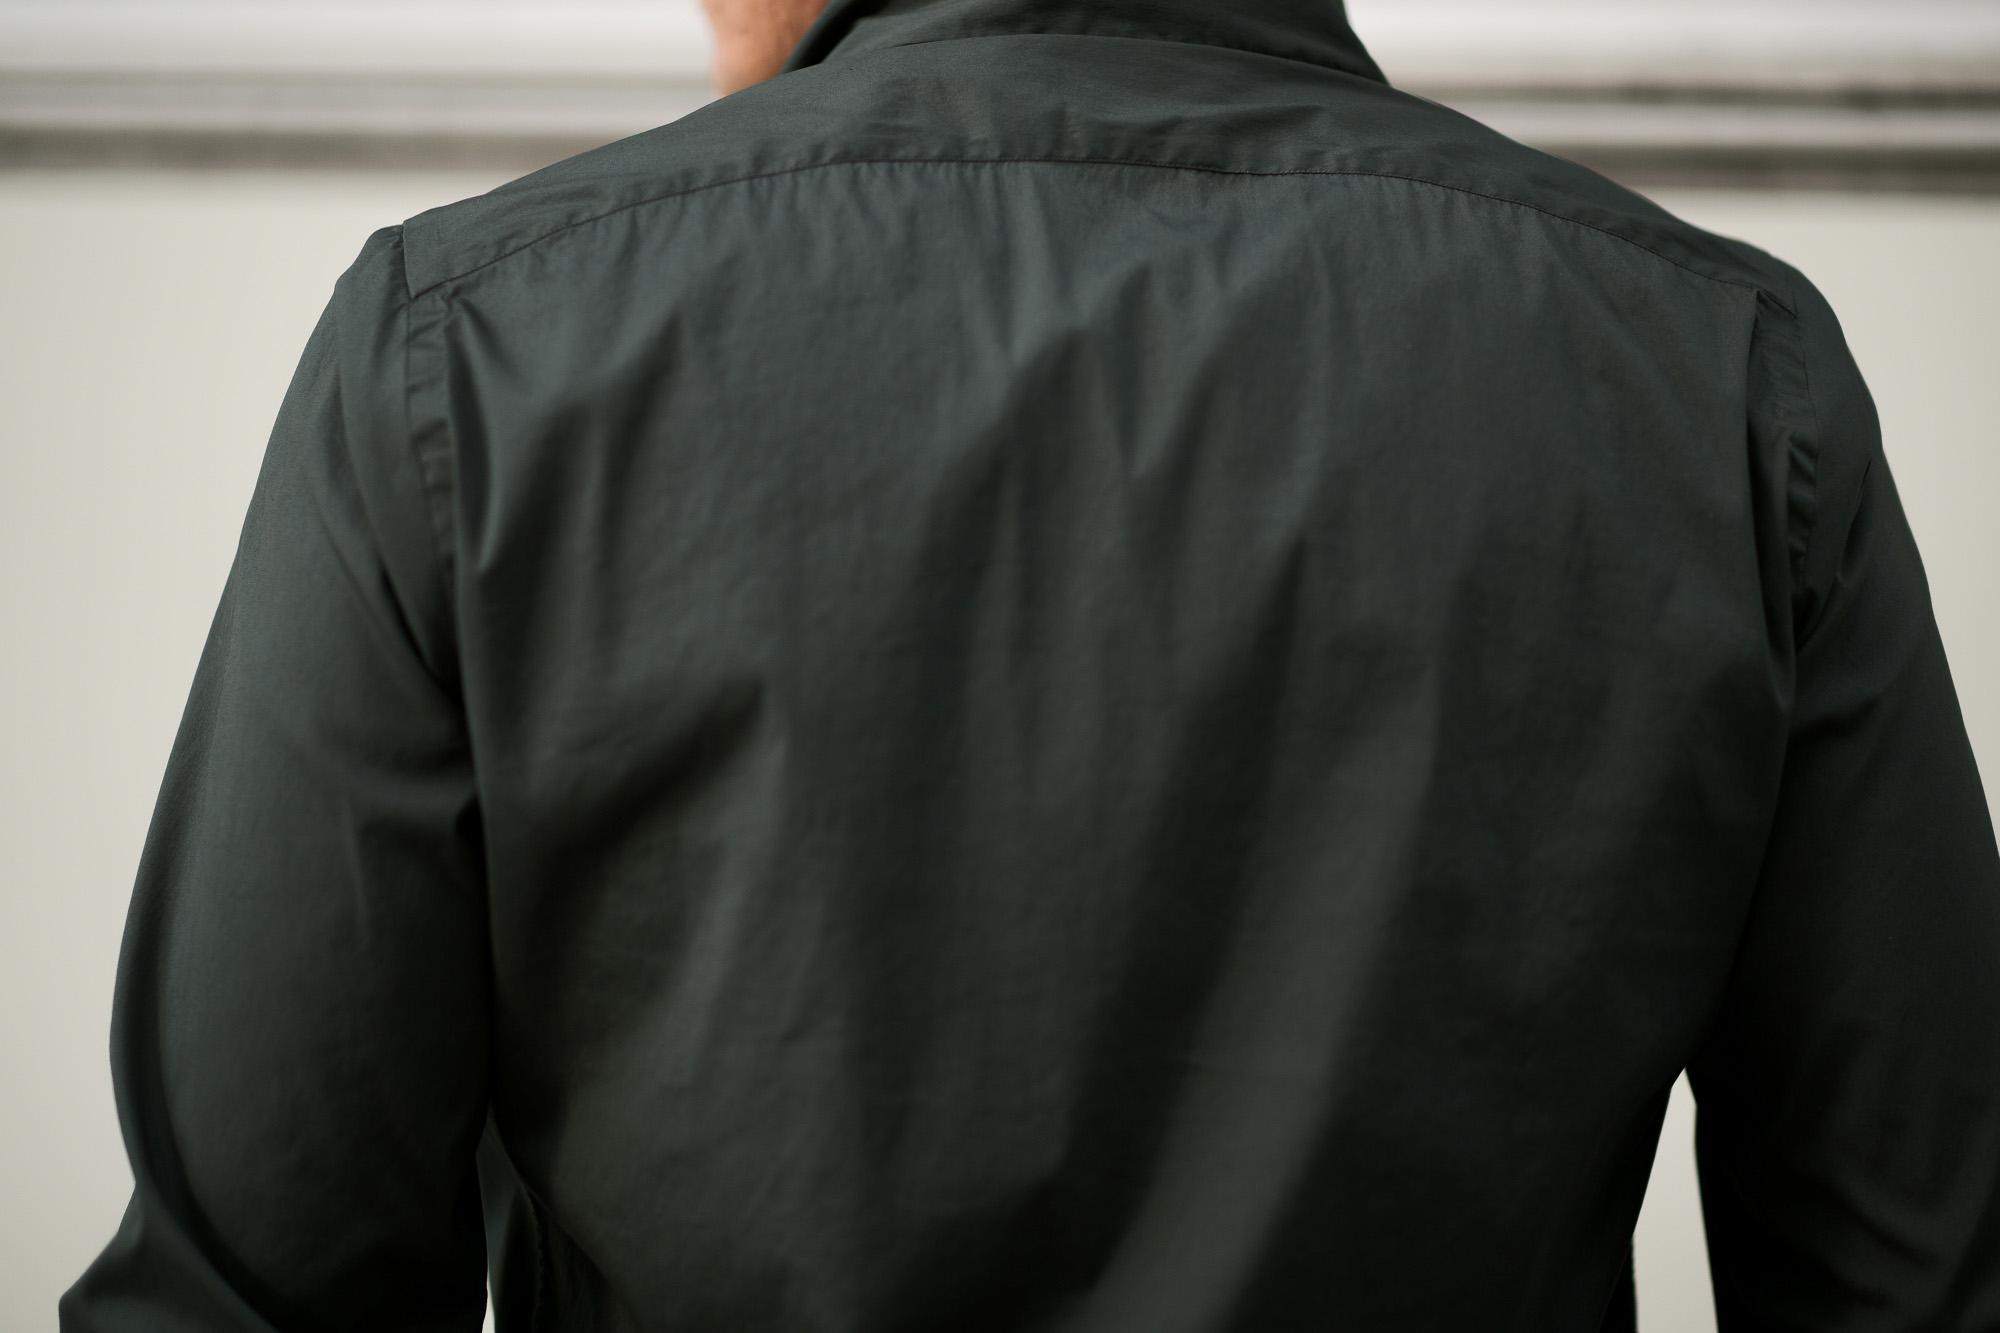 Finamore (フィナモレ) SEUL ITALIAN COLOR STRETCH COTTON SHIRTS ストレッチコットン ワンピースカラー シャツ OLIVE (オリーブ) made in italy (イタリア製) 2020 春夏新作  愛知 名古屋 altoediritto アルトエデリット シャツ